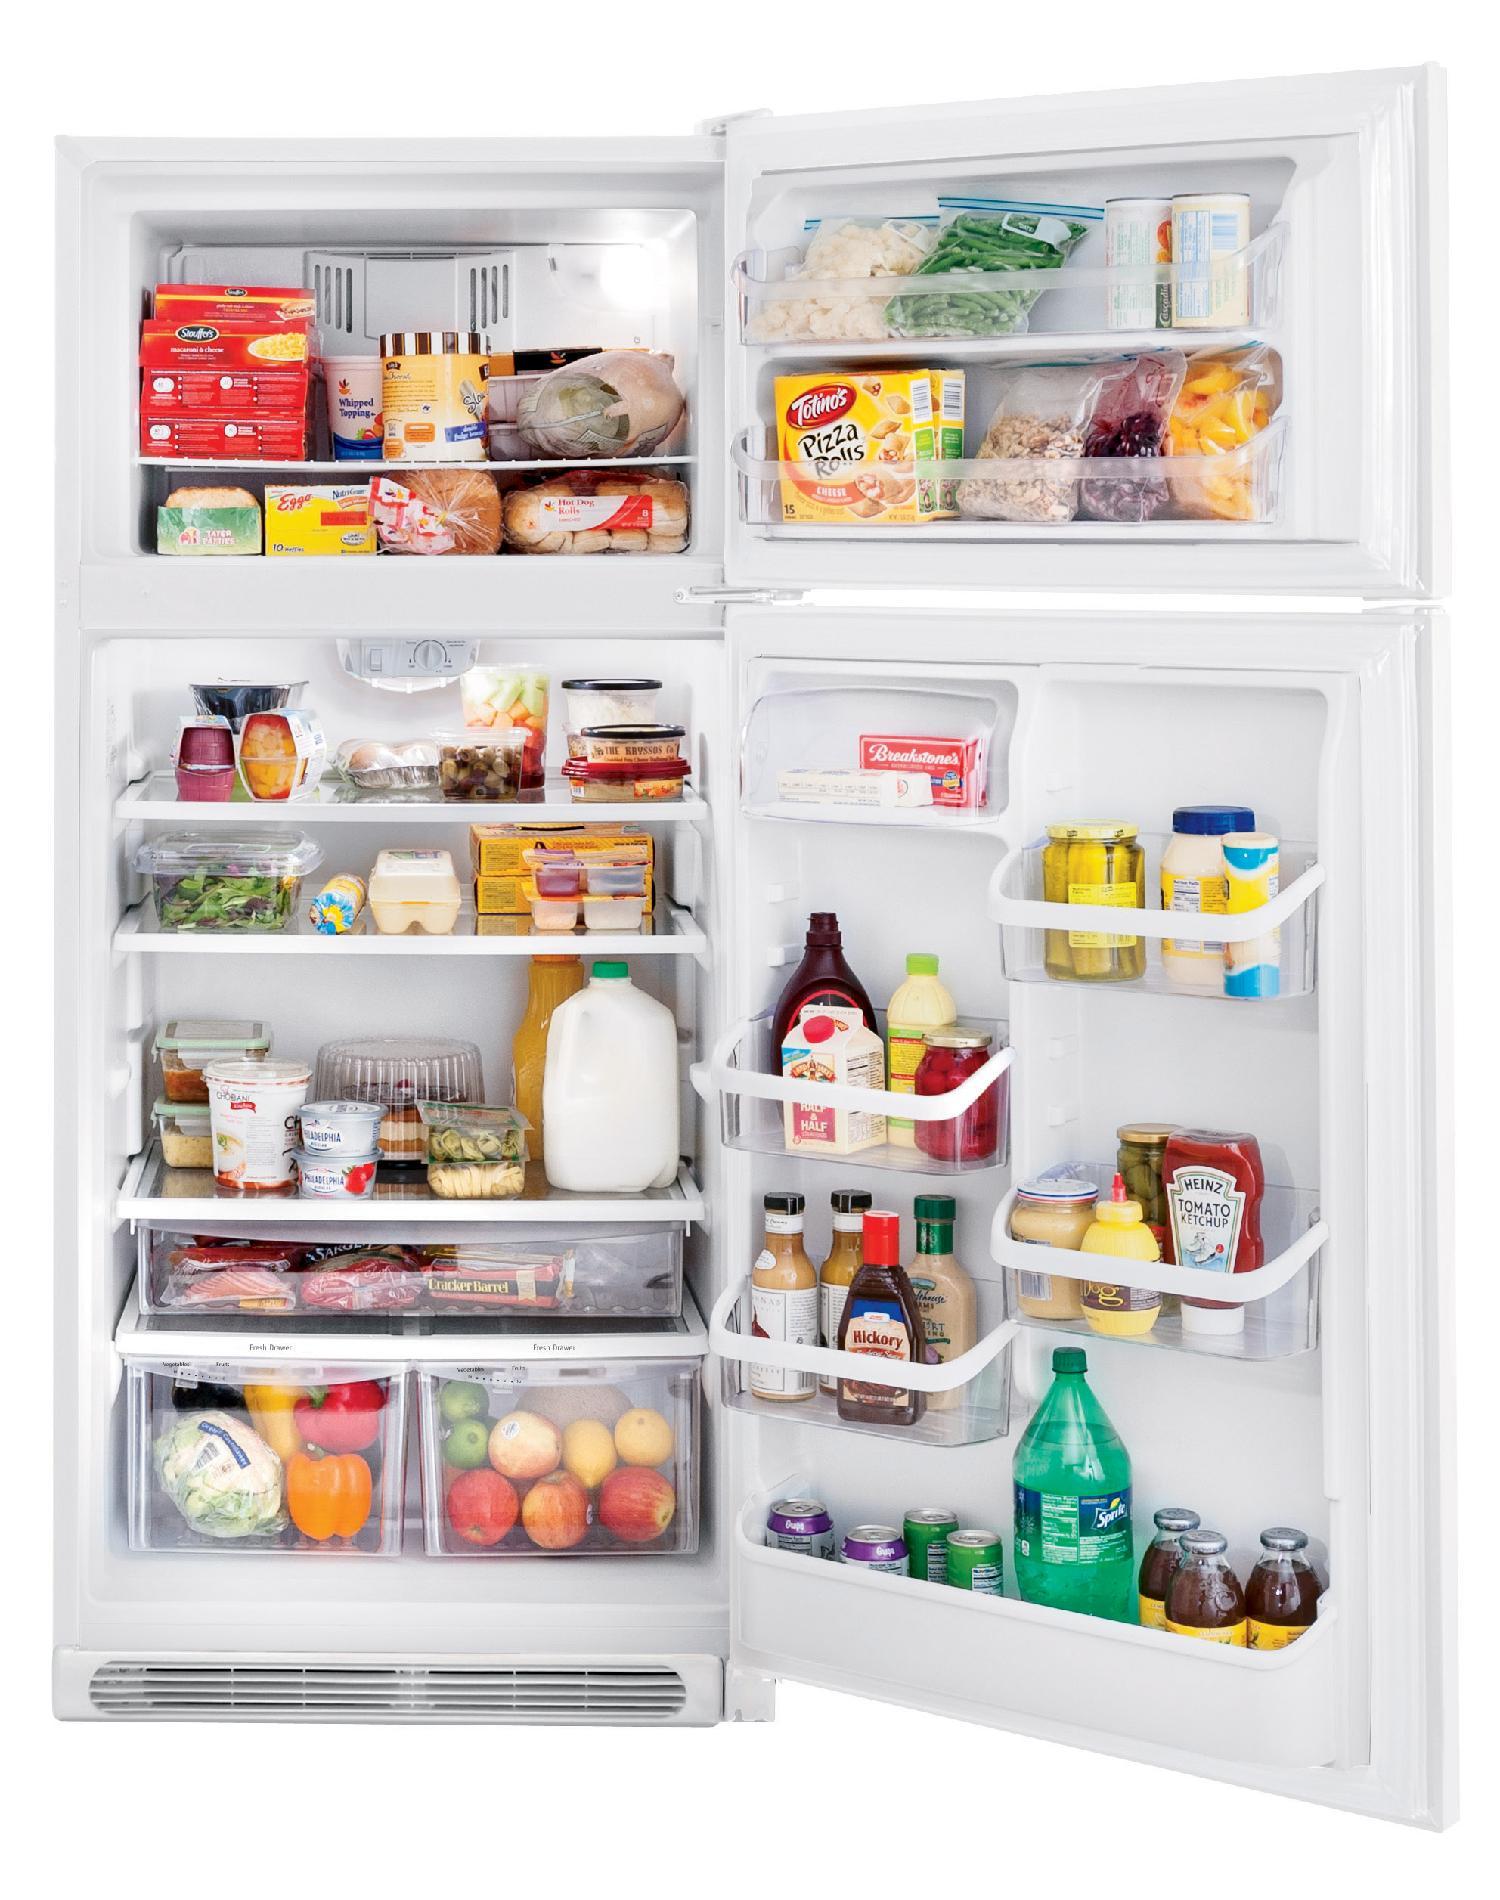 Frigidaire Gallery Gallery 18.3 cu. ft. Top-Freezer Refrigerator - Pearl White